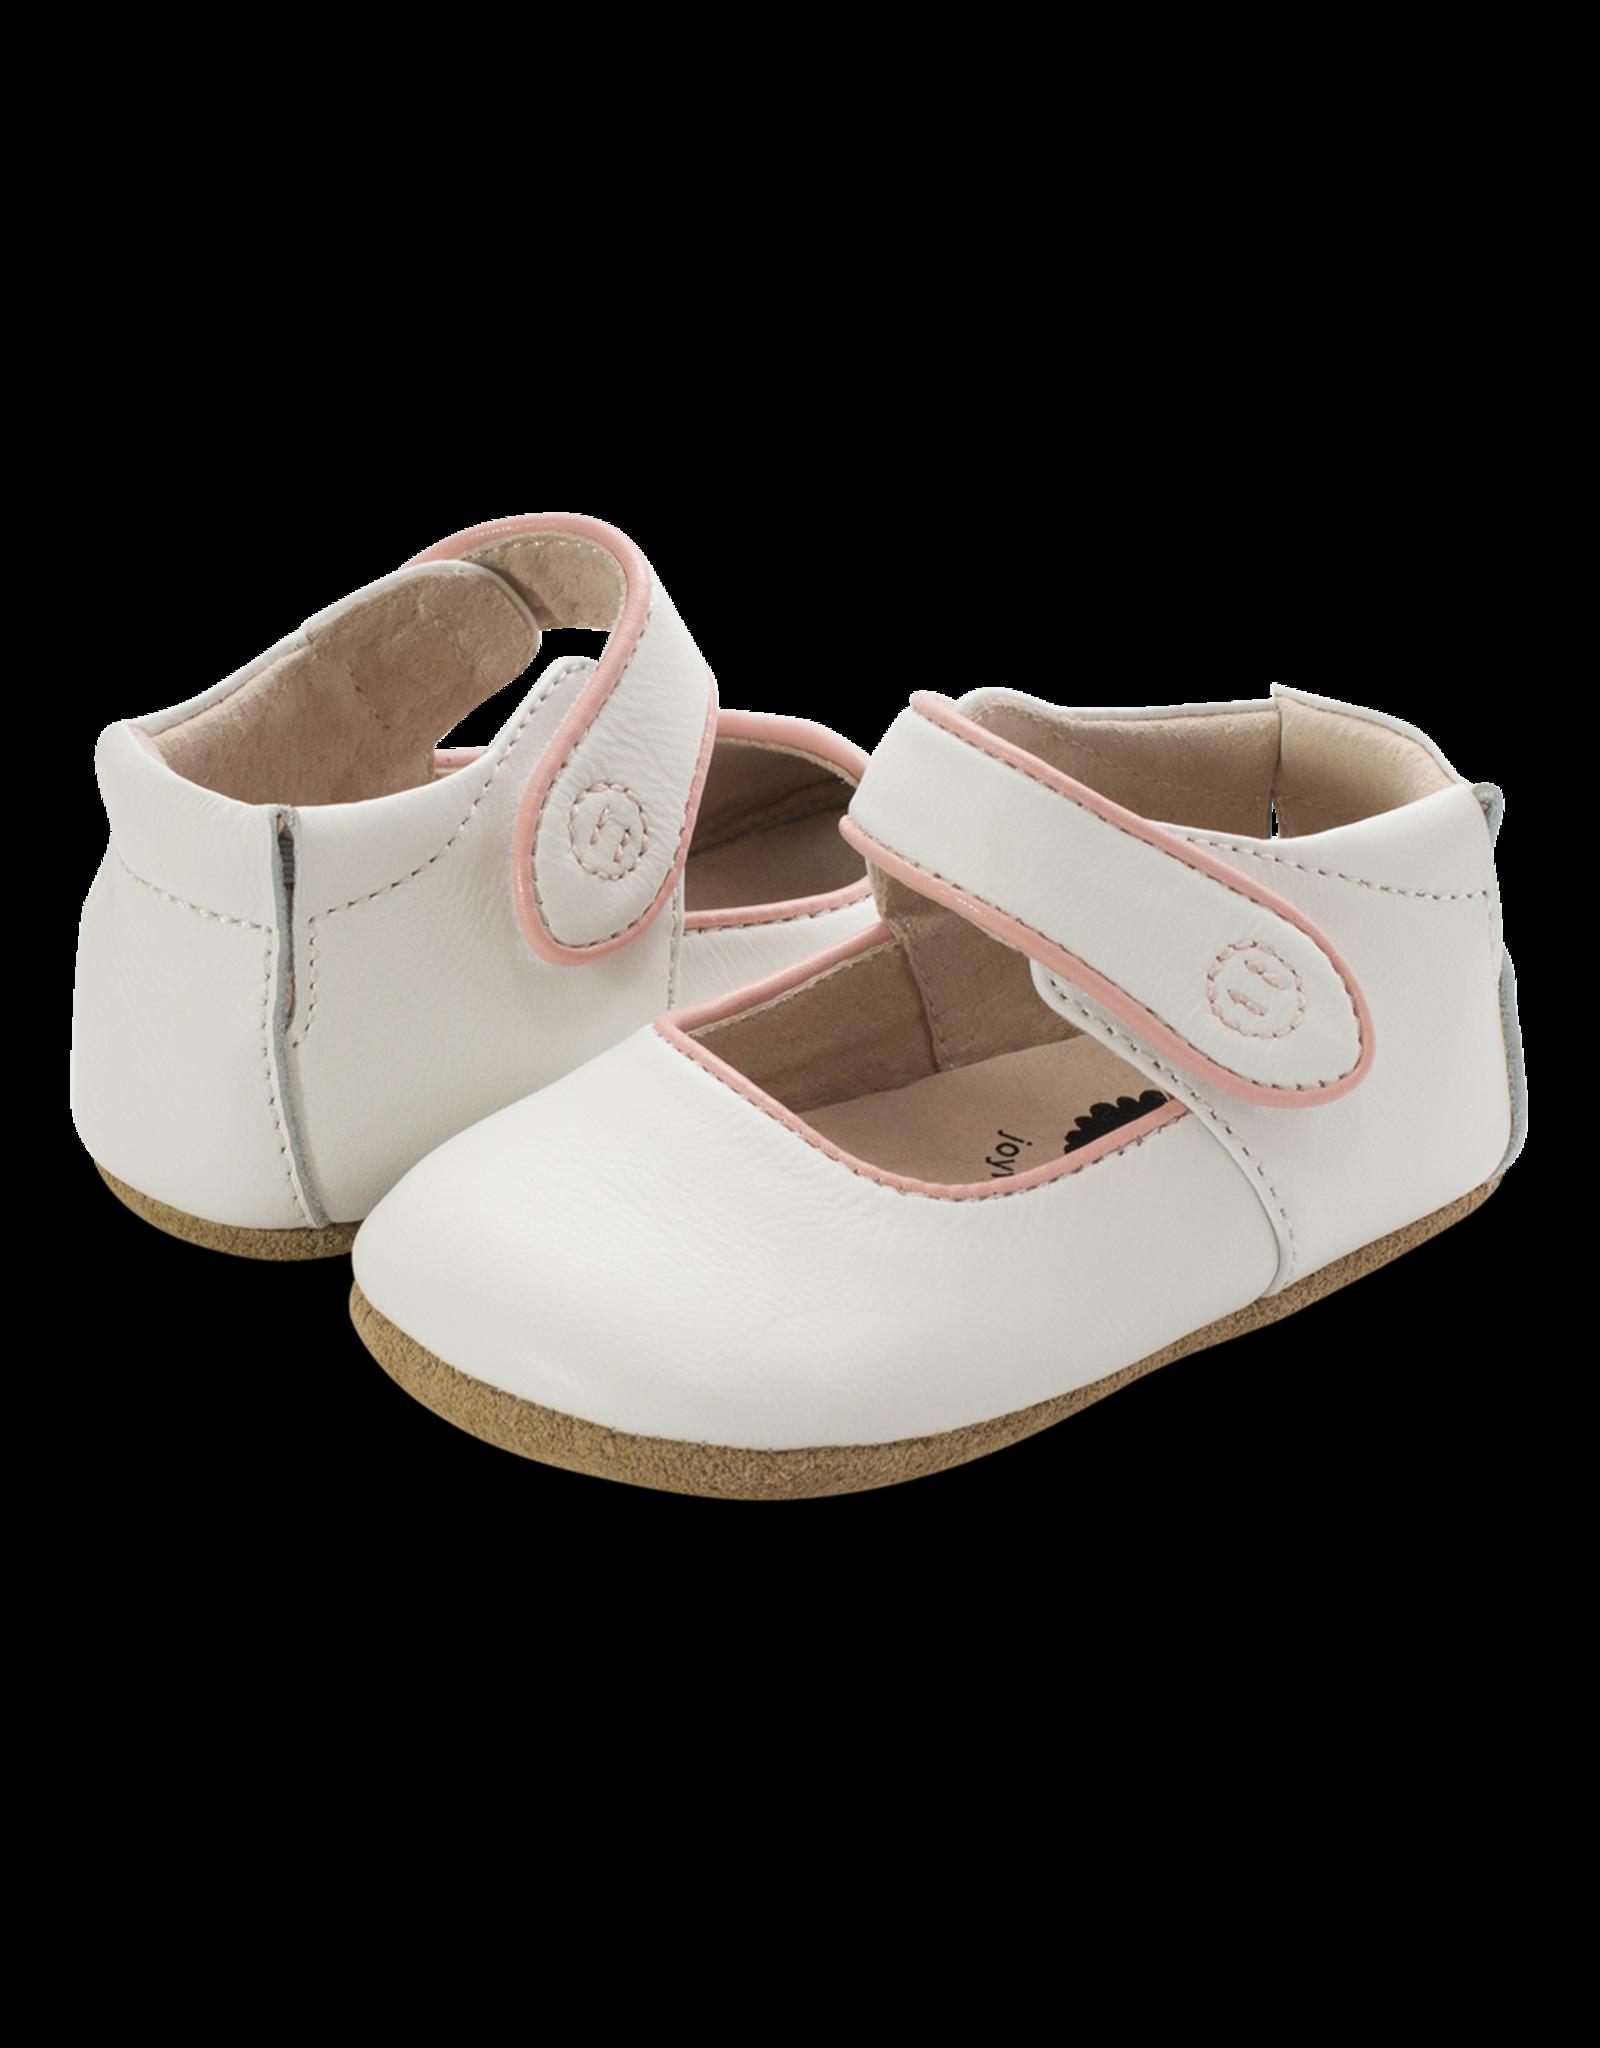 Livie & Luca Penny Mary Jane Baby Shoe